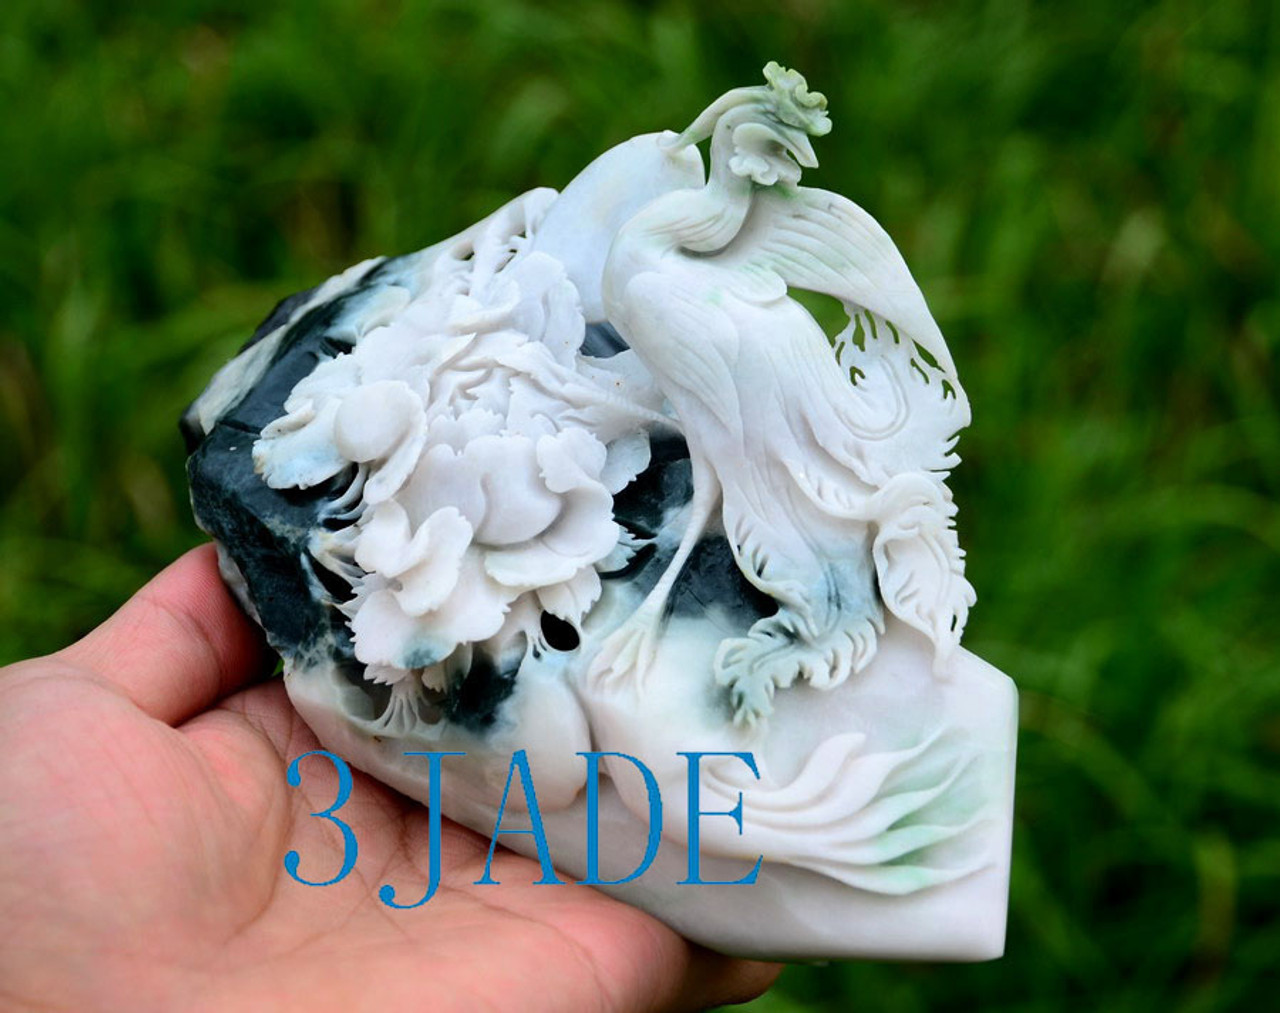 Jade Bird Flower Statue